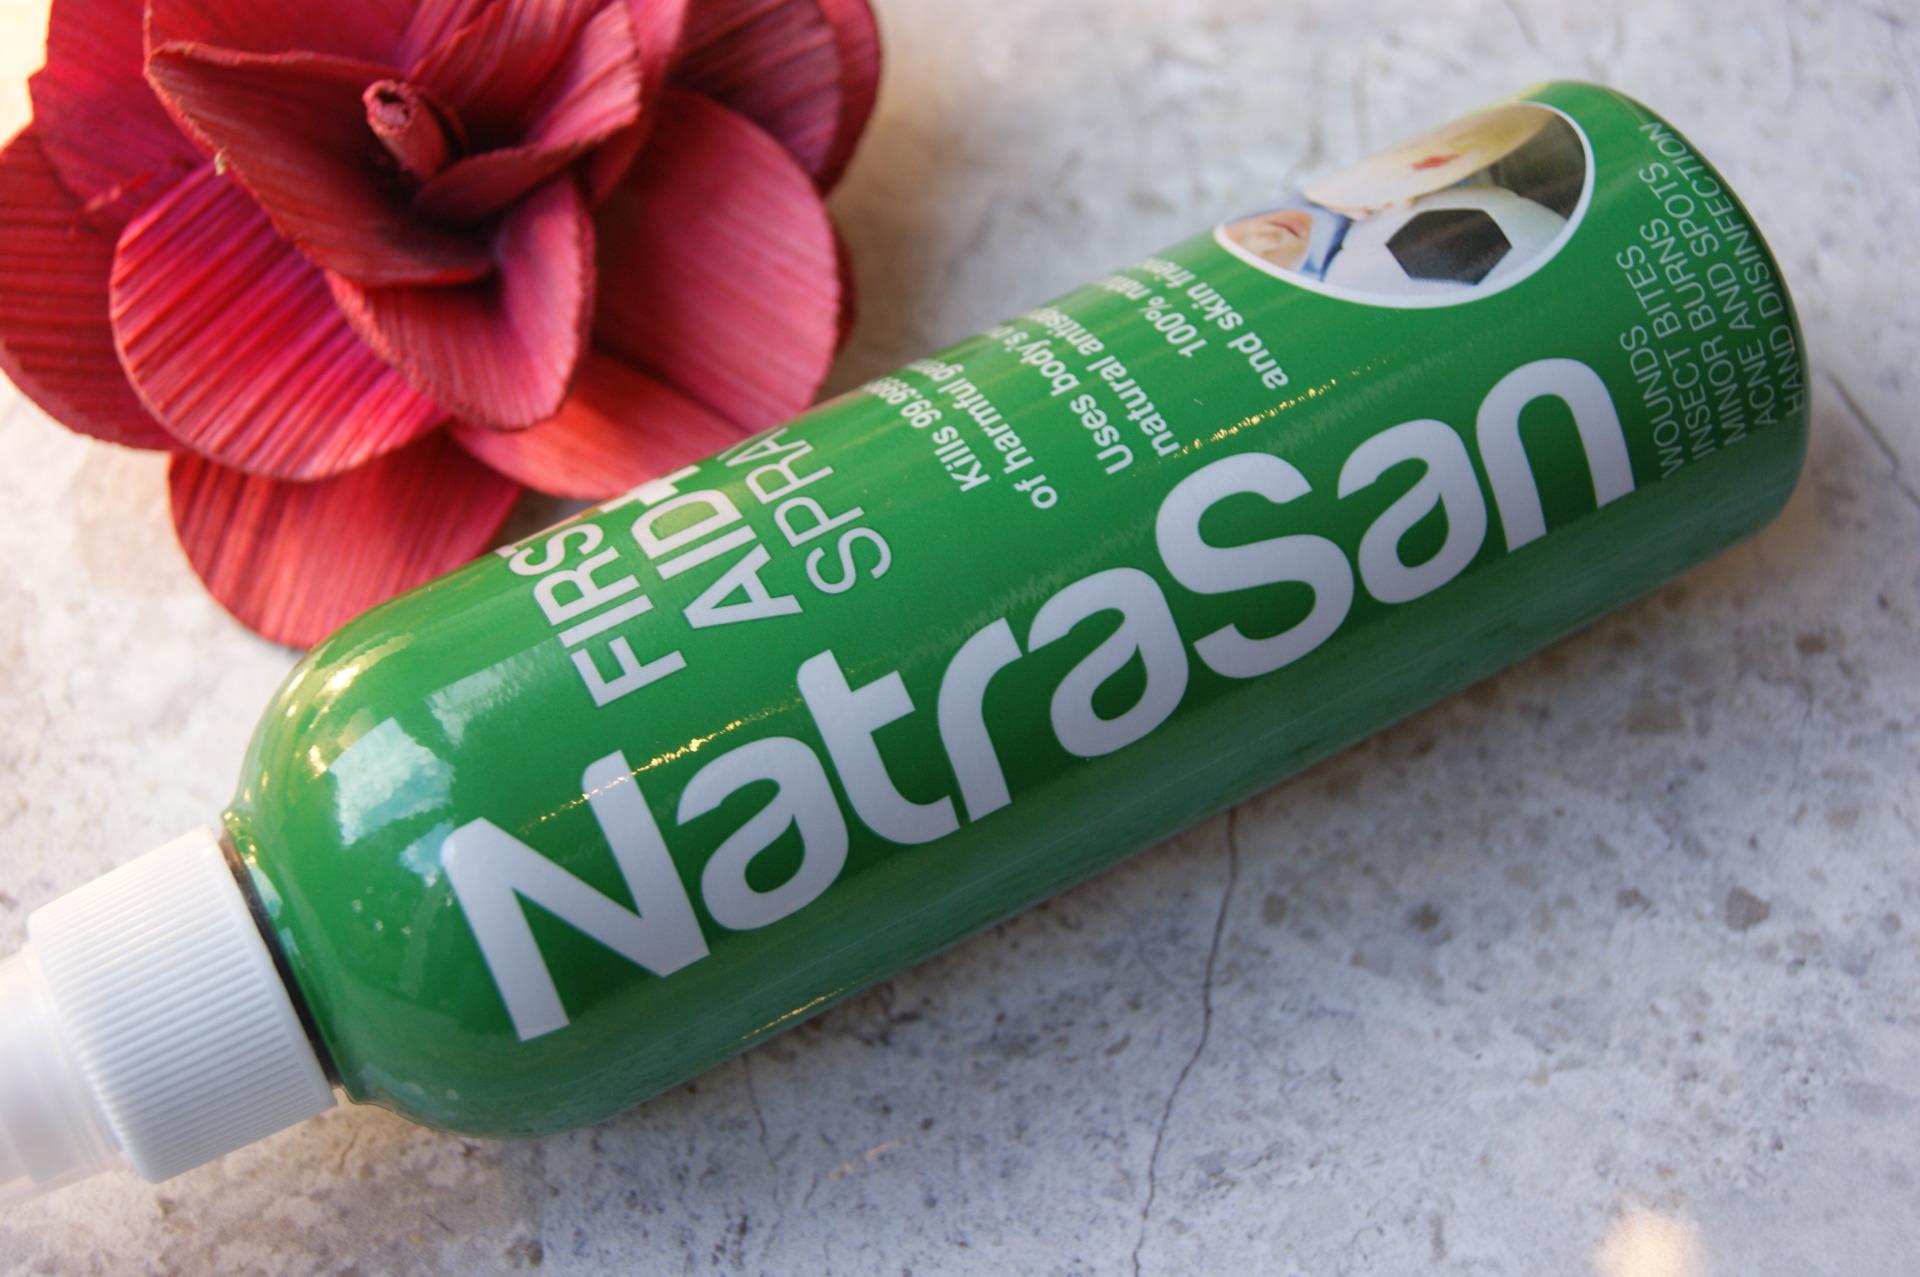 Natrasan - First Aid Spray